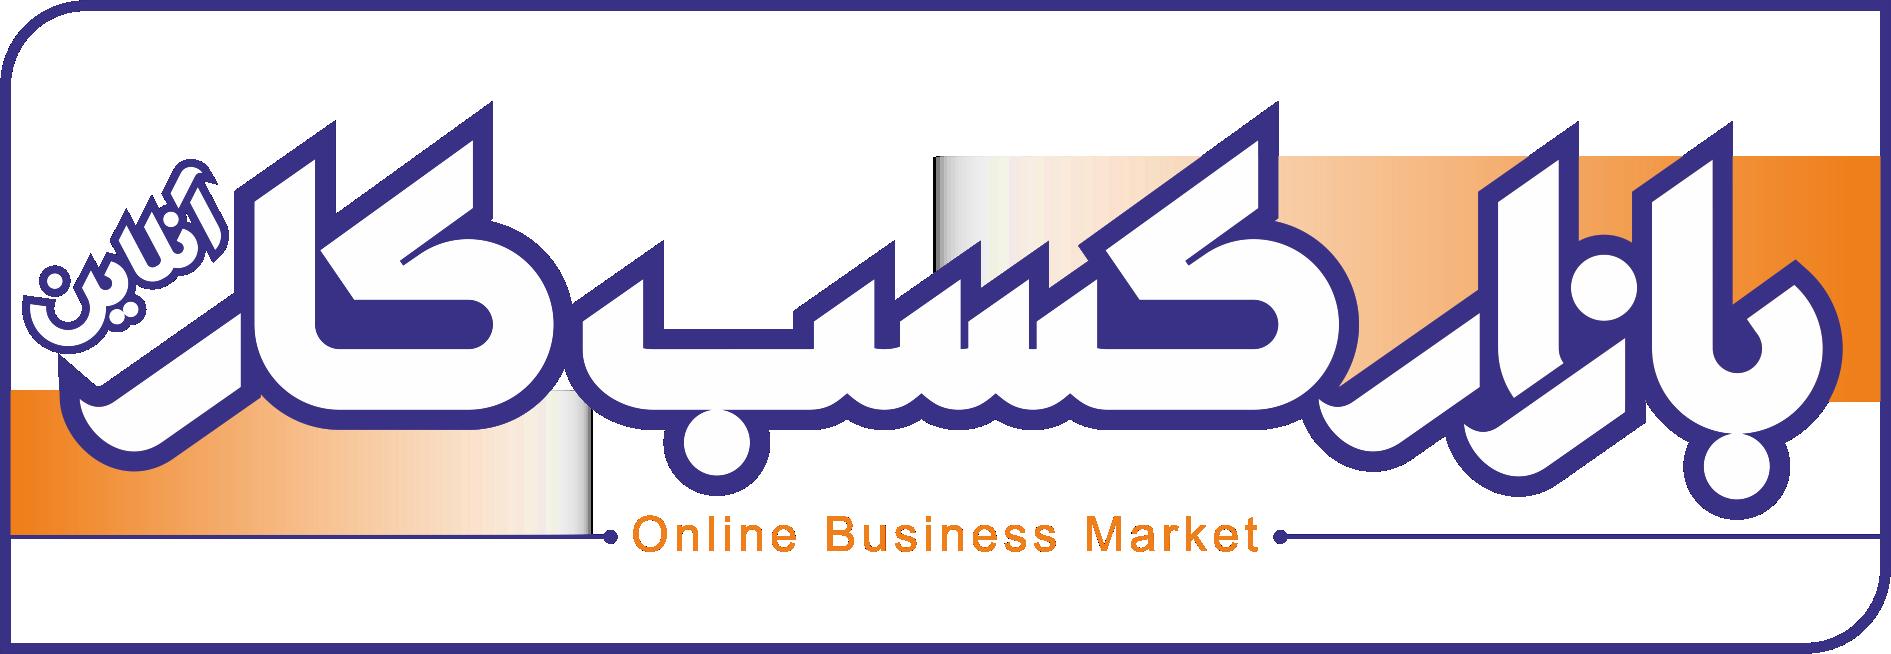 بازار کسب کار آنلاین